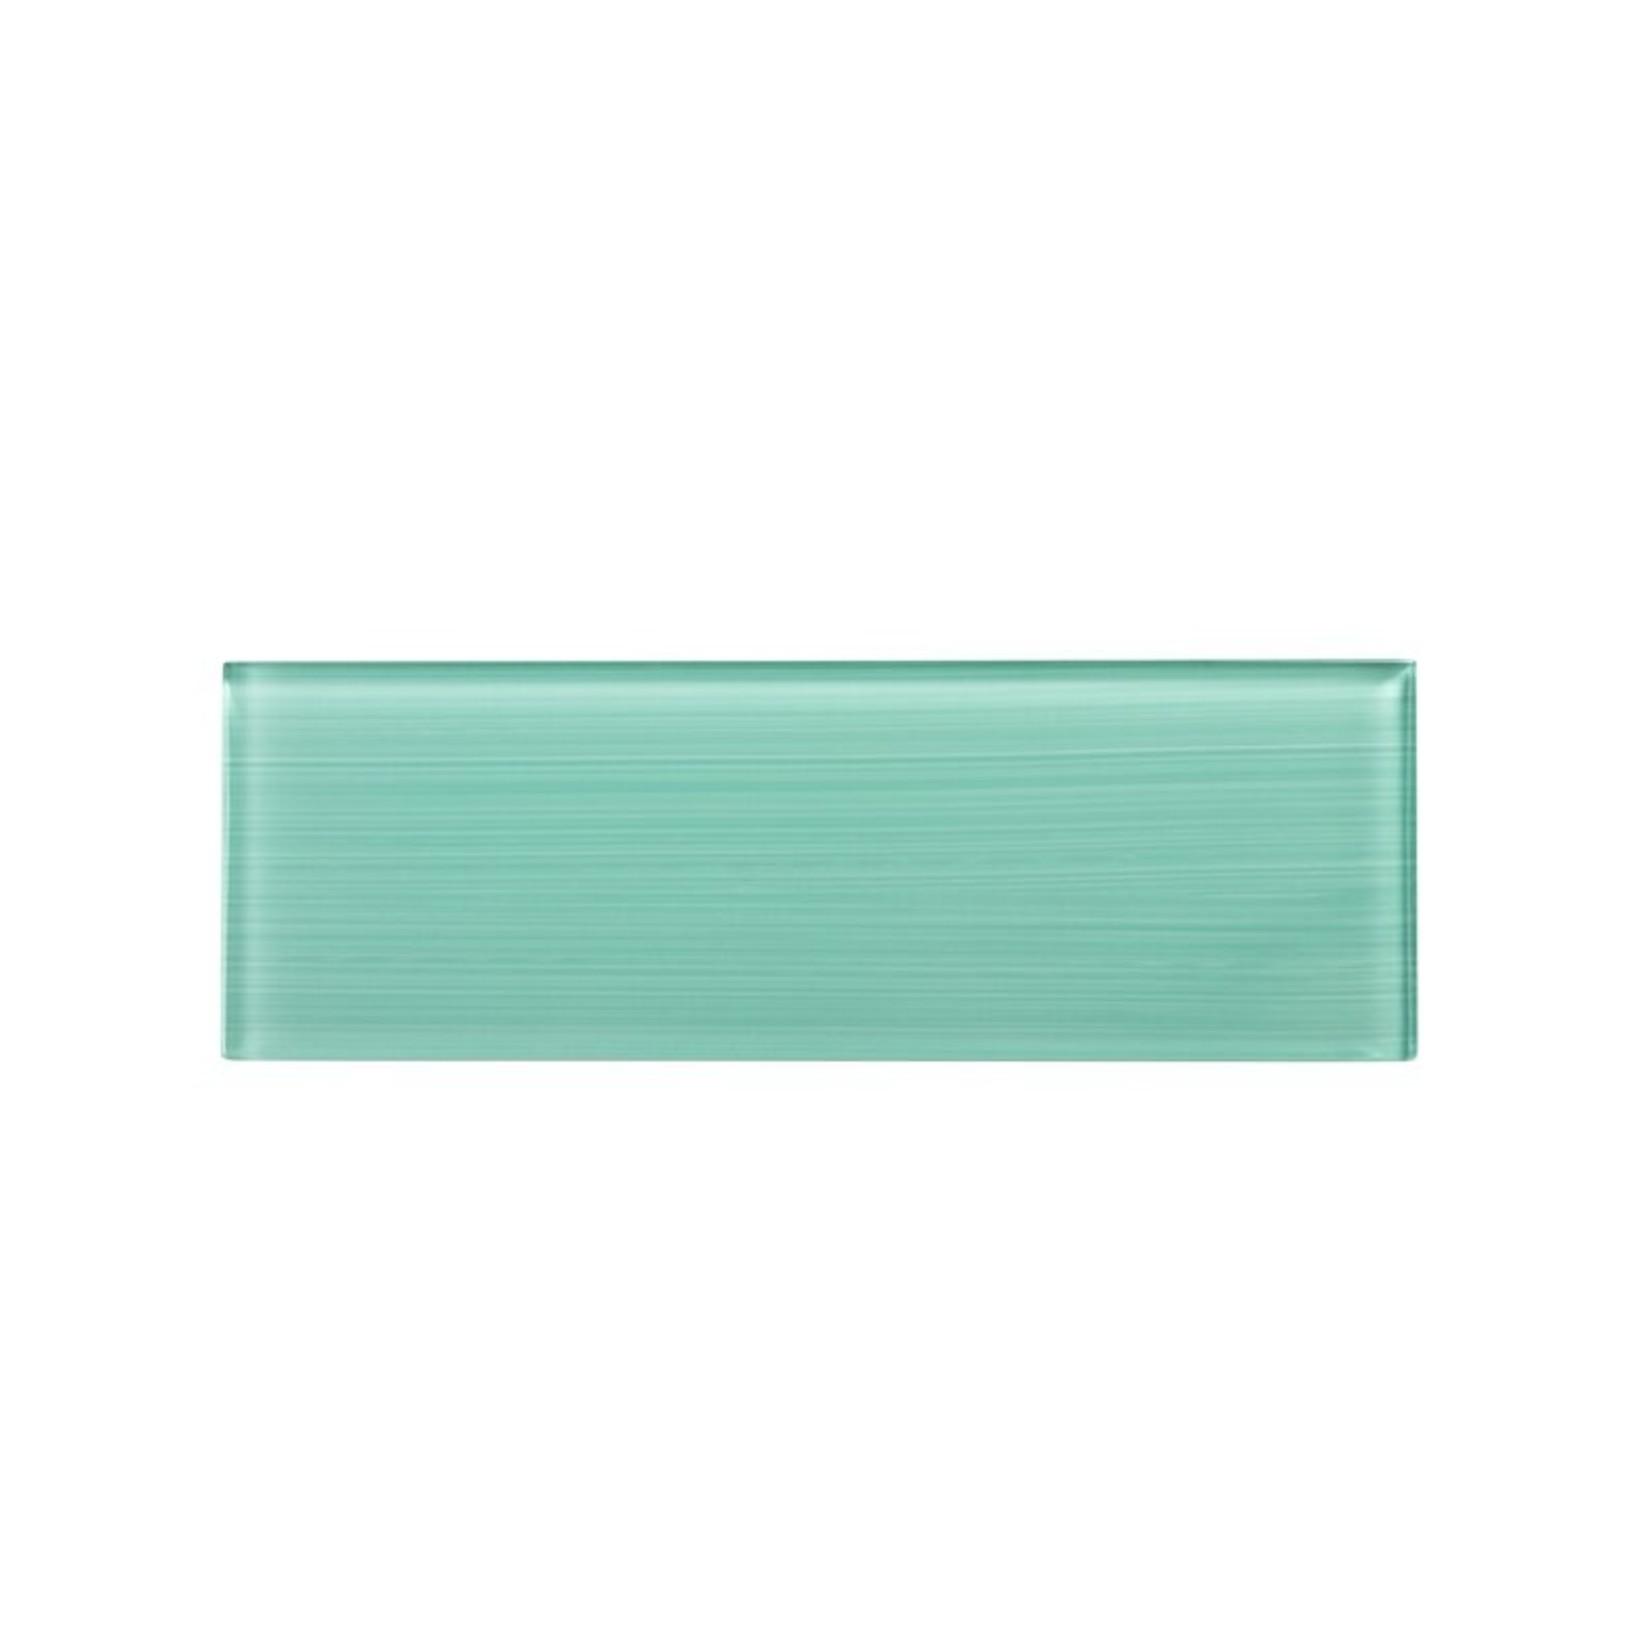 "*4"" x 12"" - Premium Hand Painted  Glass Subway Tile - 5 sq ft  - Final Sale"